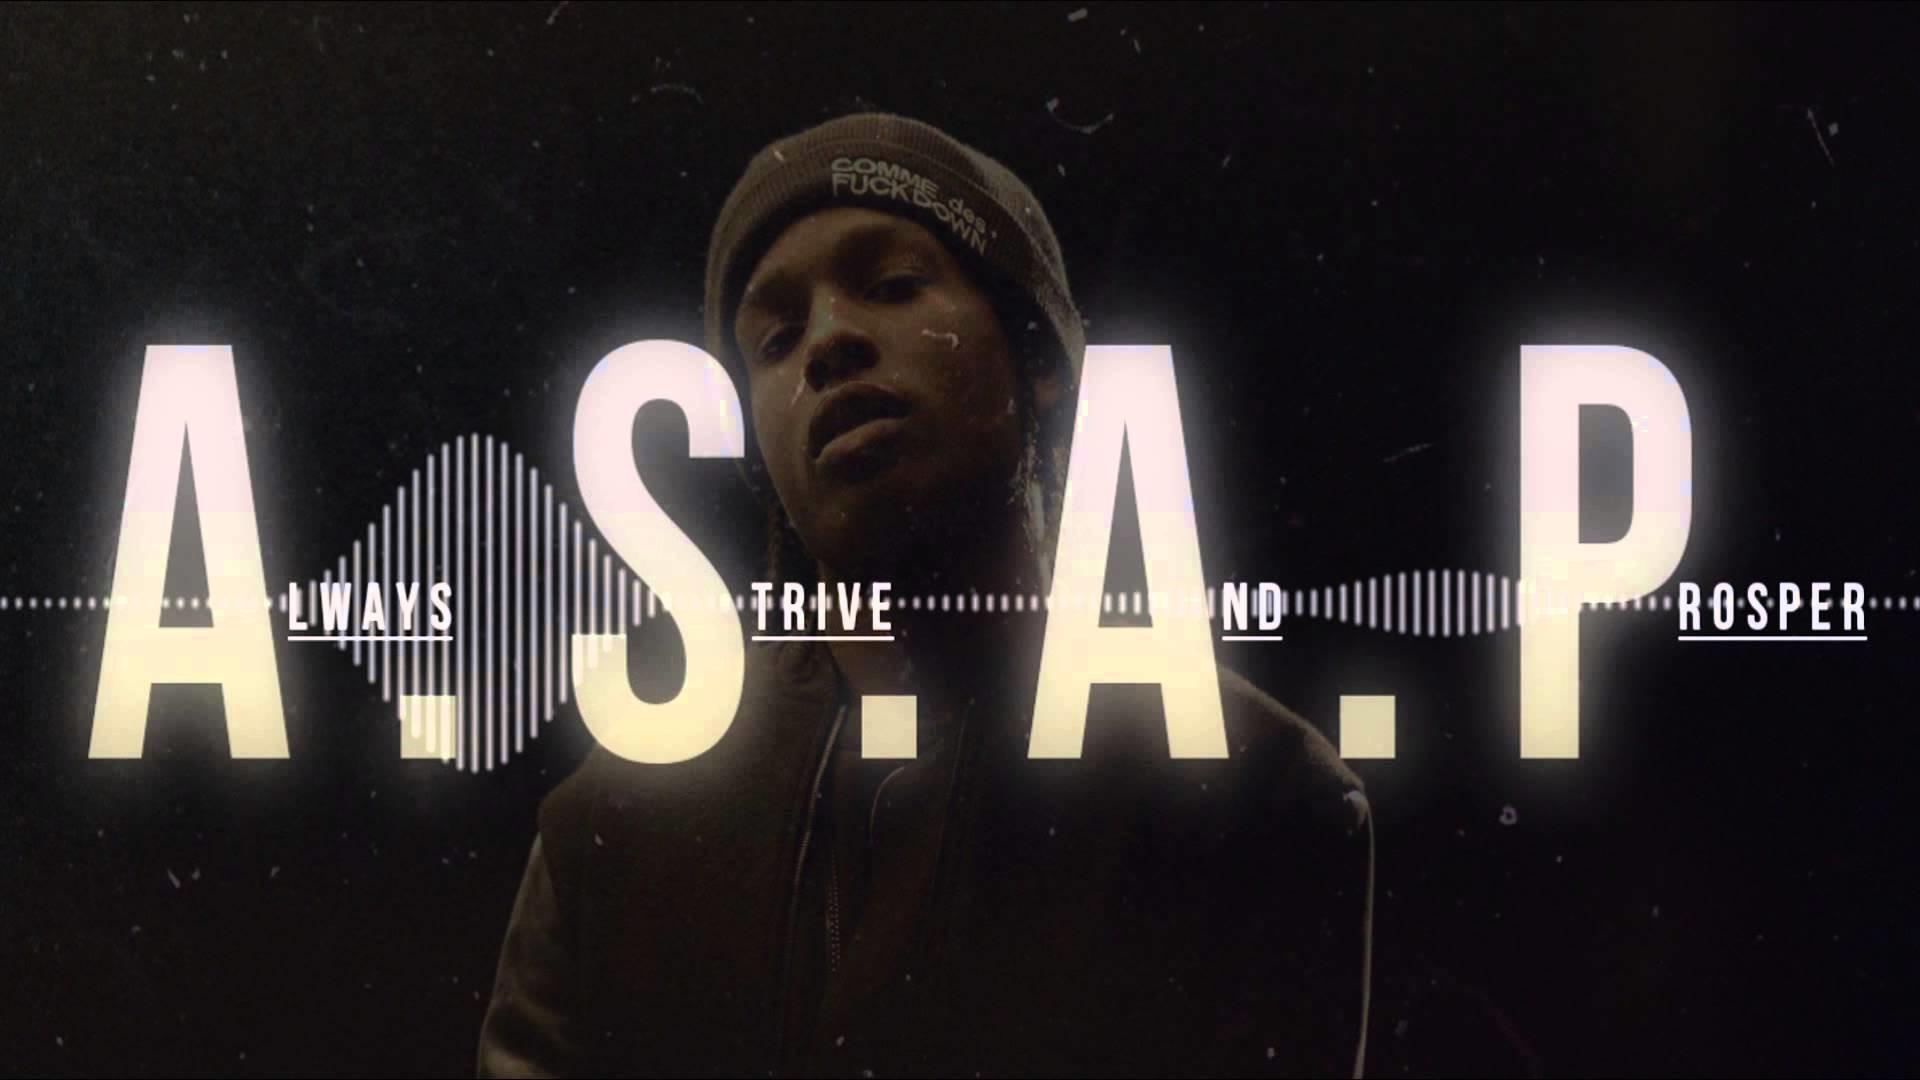 ASAP Rocky/ASAP Mob Type Beat (At.Long.Last.ASAP) (Prod. Deleralo) – YouTube